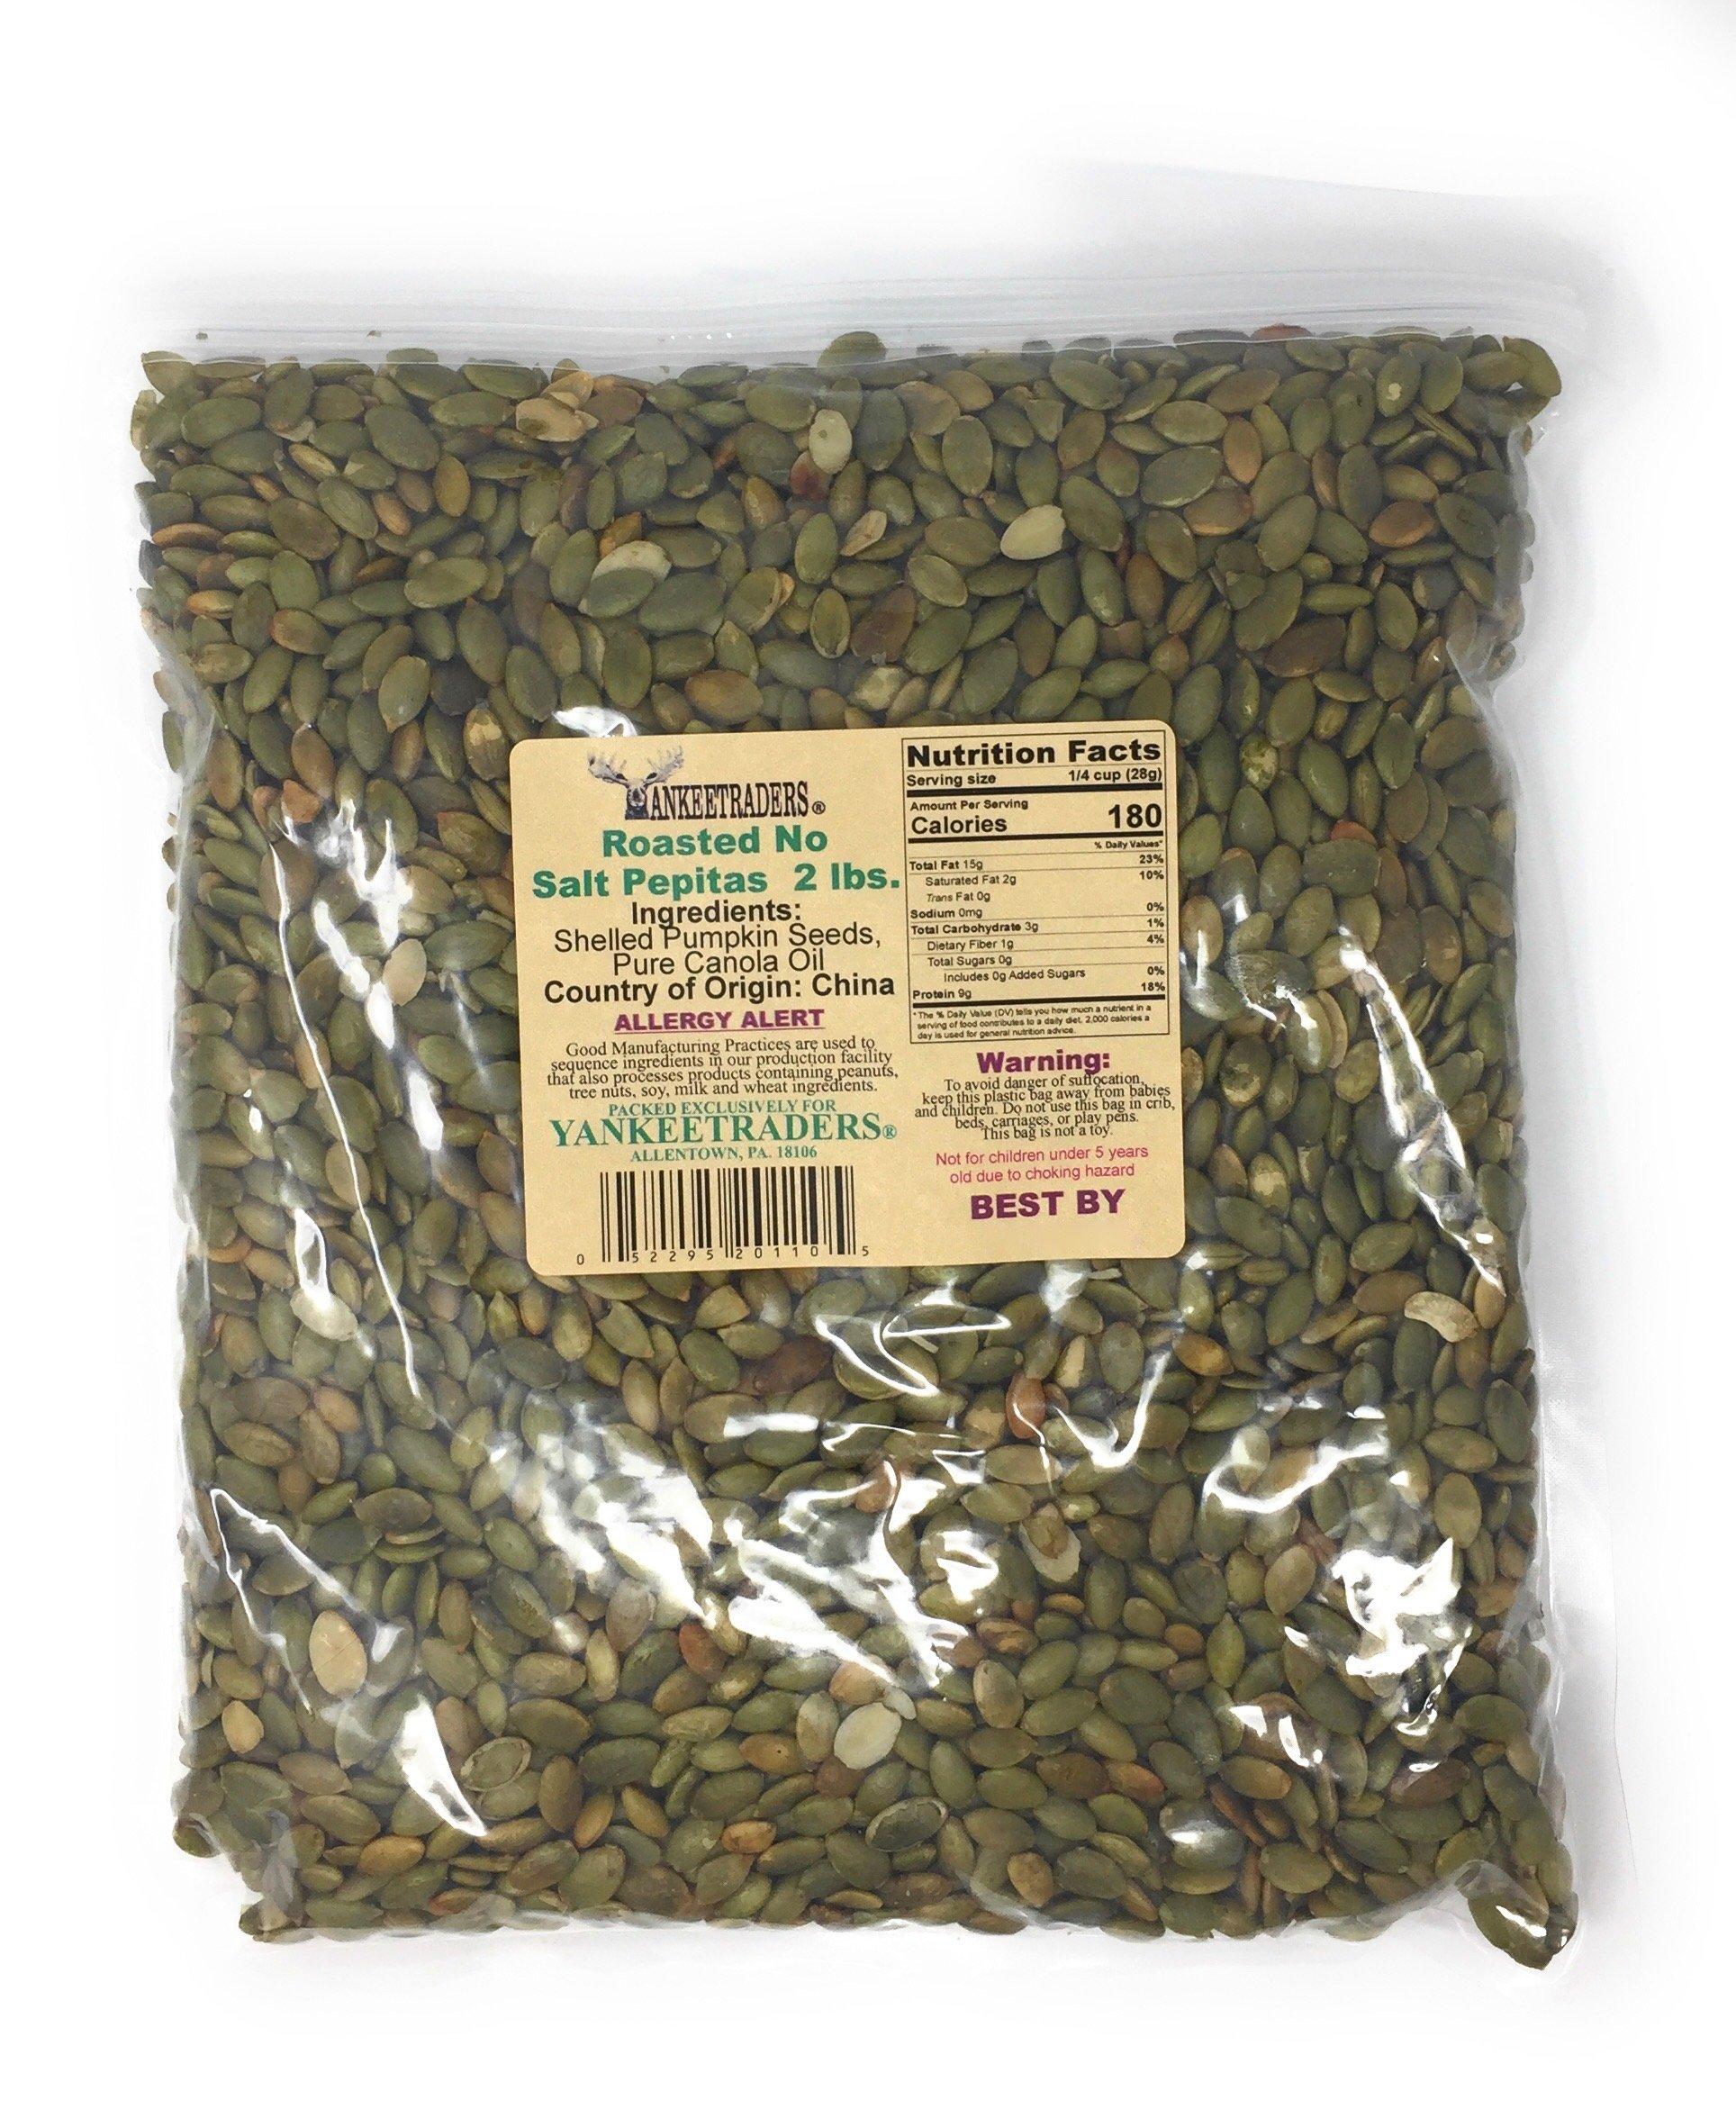 Yankee Traders Pepita/Pumpkin Seeds, Roasted, No Salt Added, 2 Pound by YANKEETRADERS